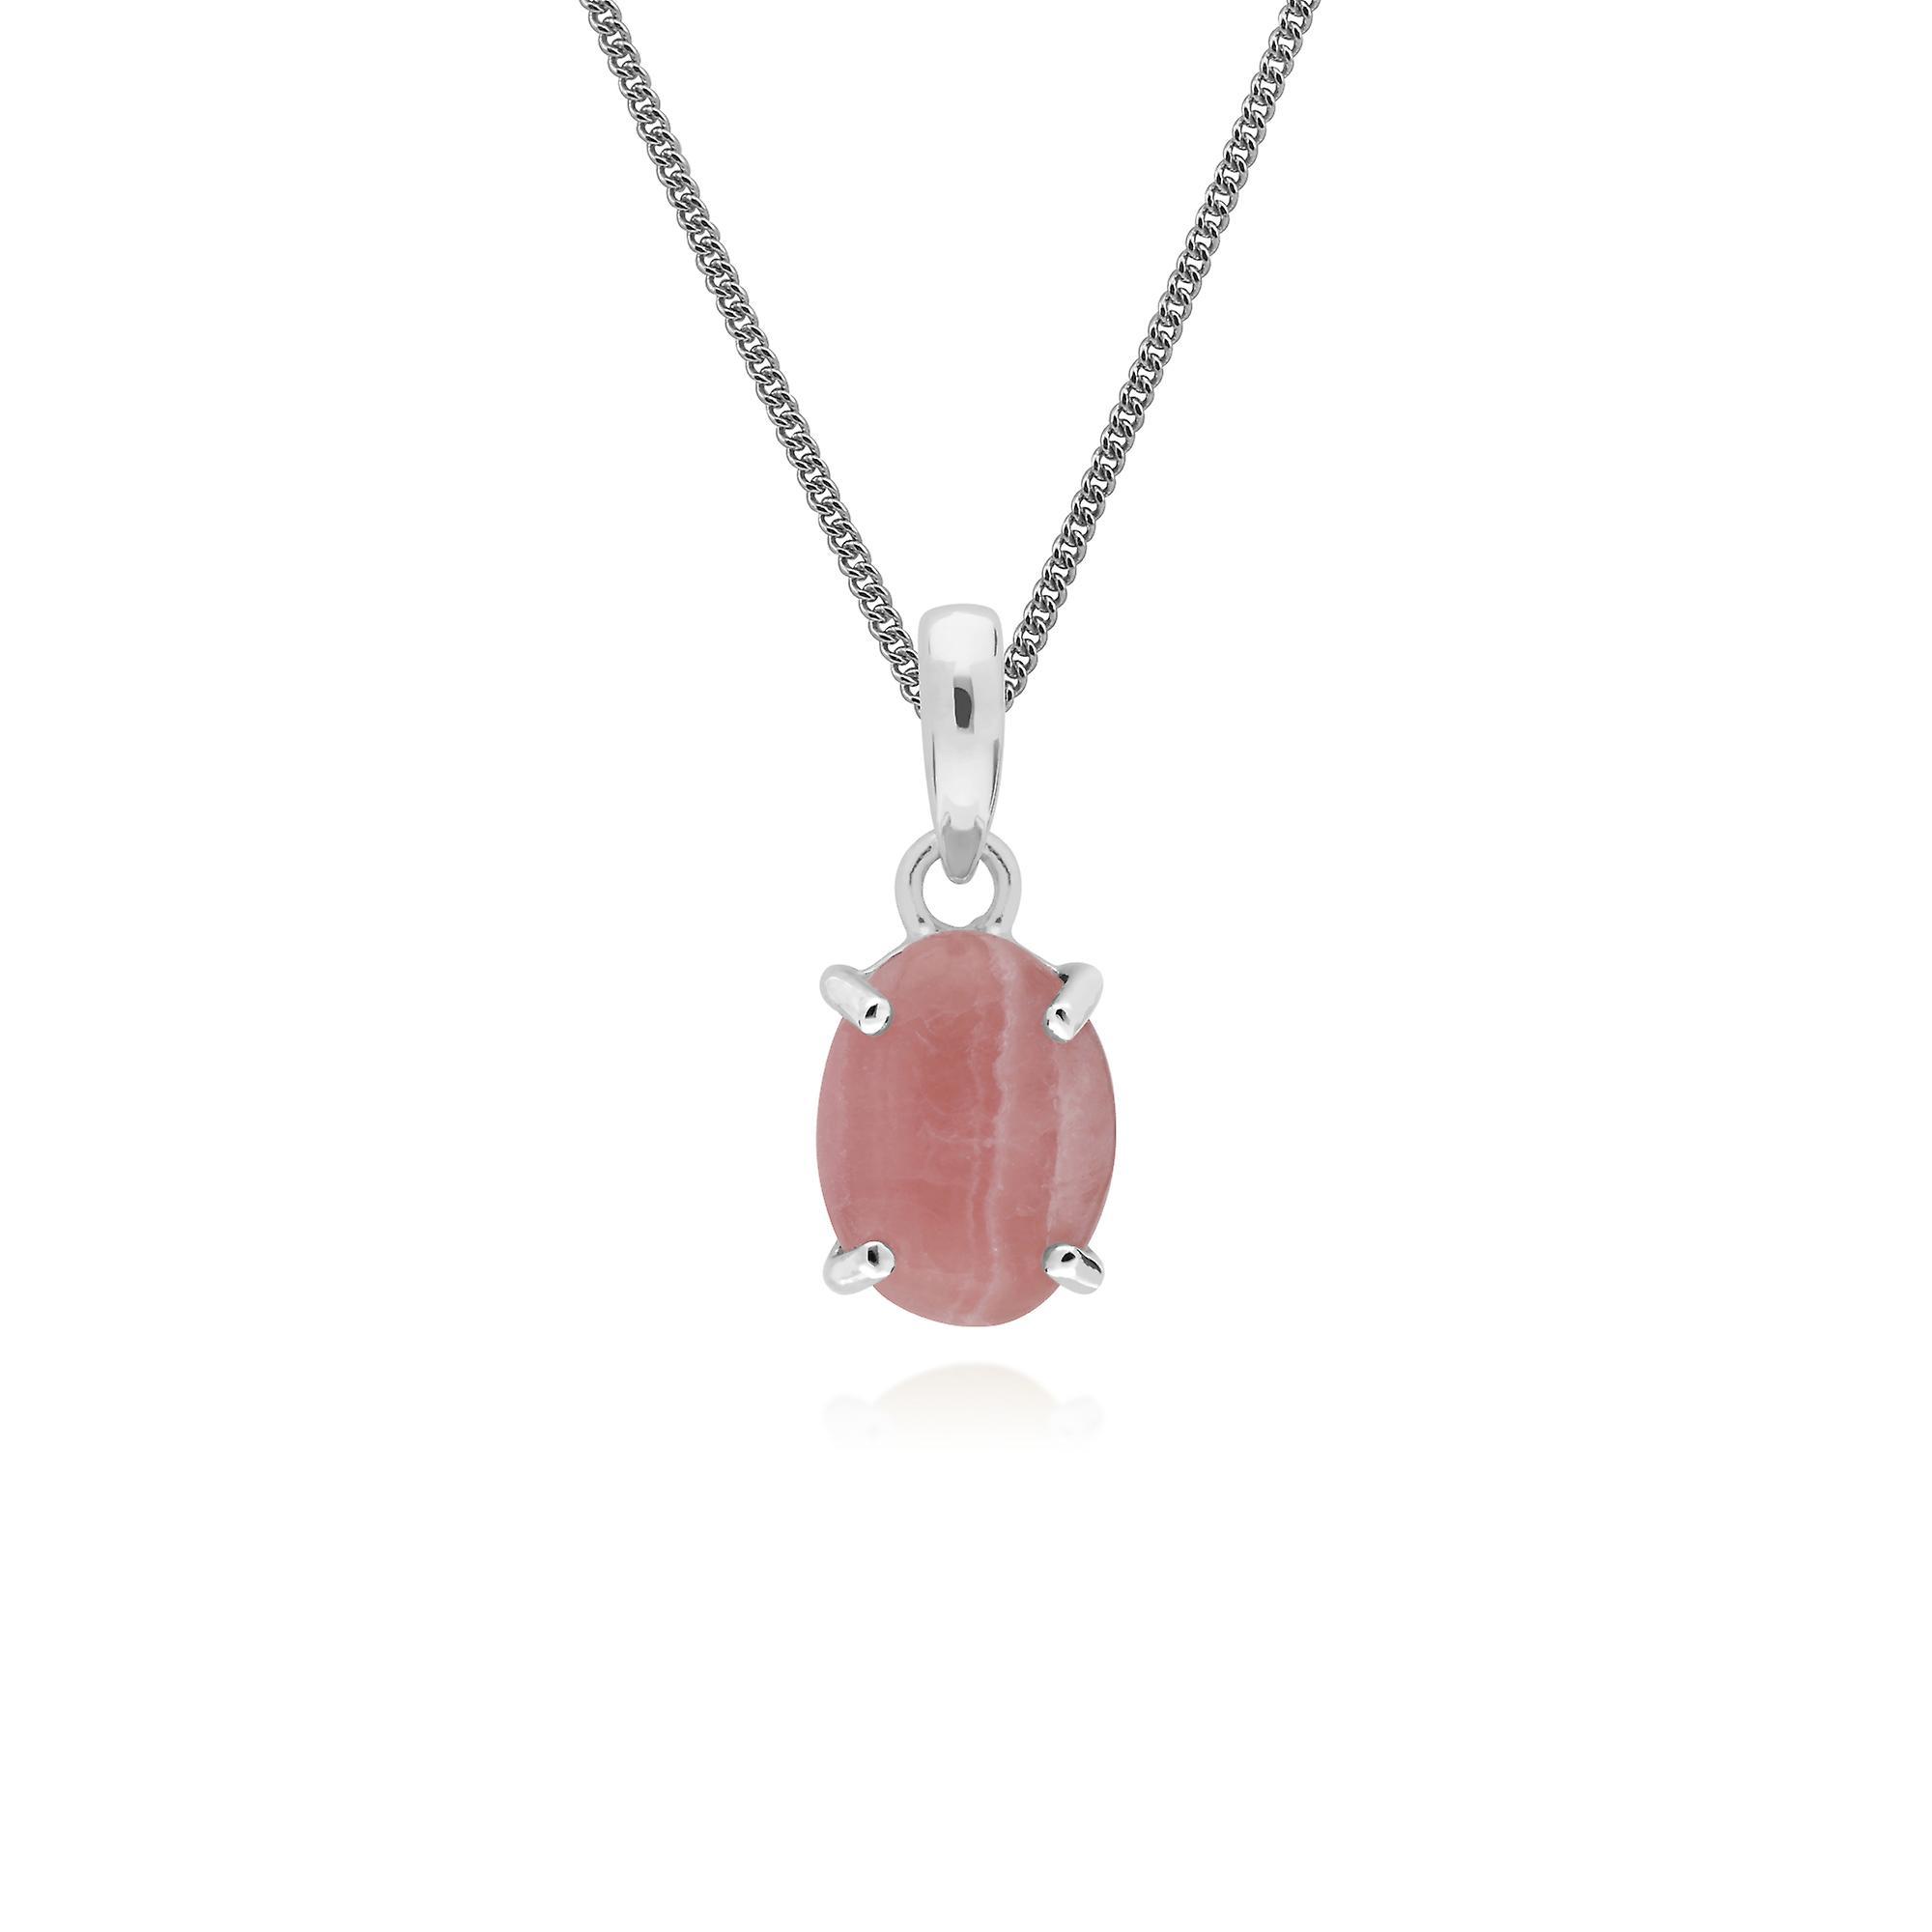 Gemondo Sterling Silver Rhodochrosite Single Stone Oval 45cm Necklace